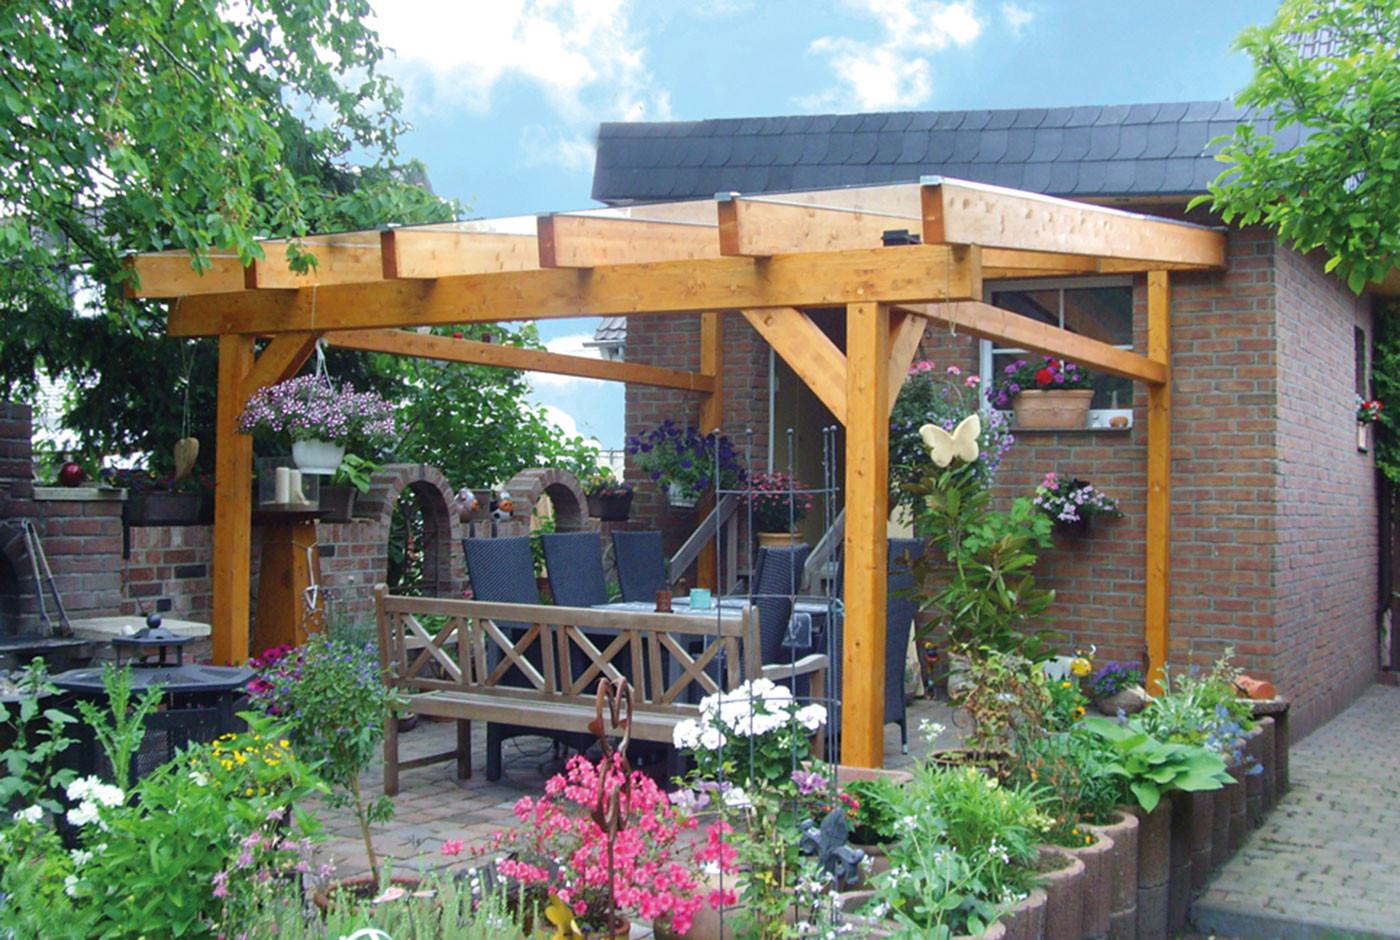 Pergola was genau ist eigentlich eine garten pergola - Gartengestaltung pergola ...